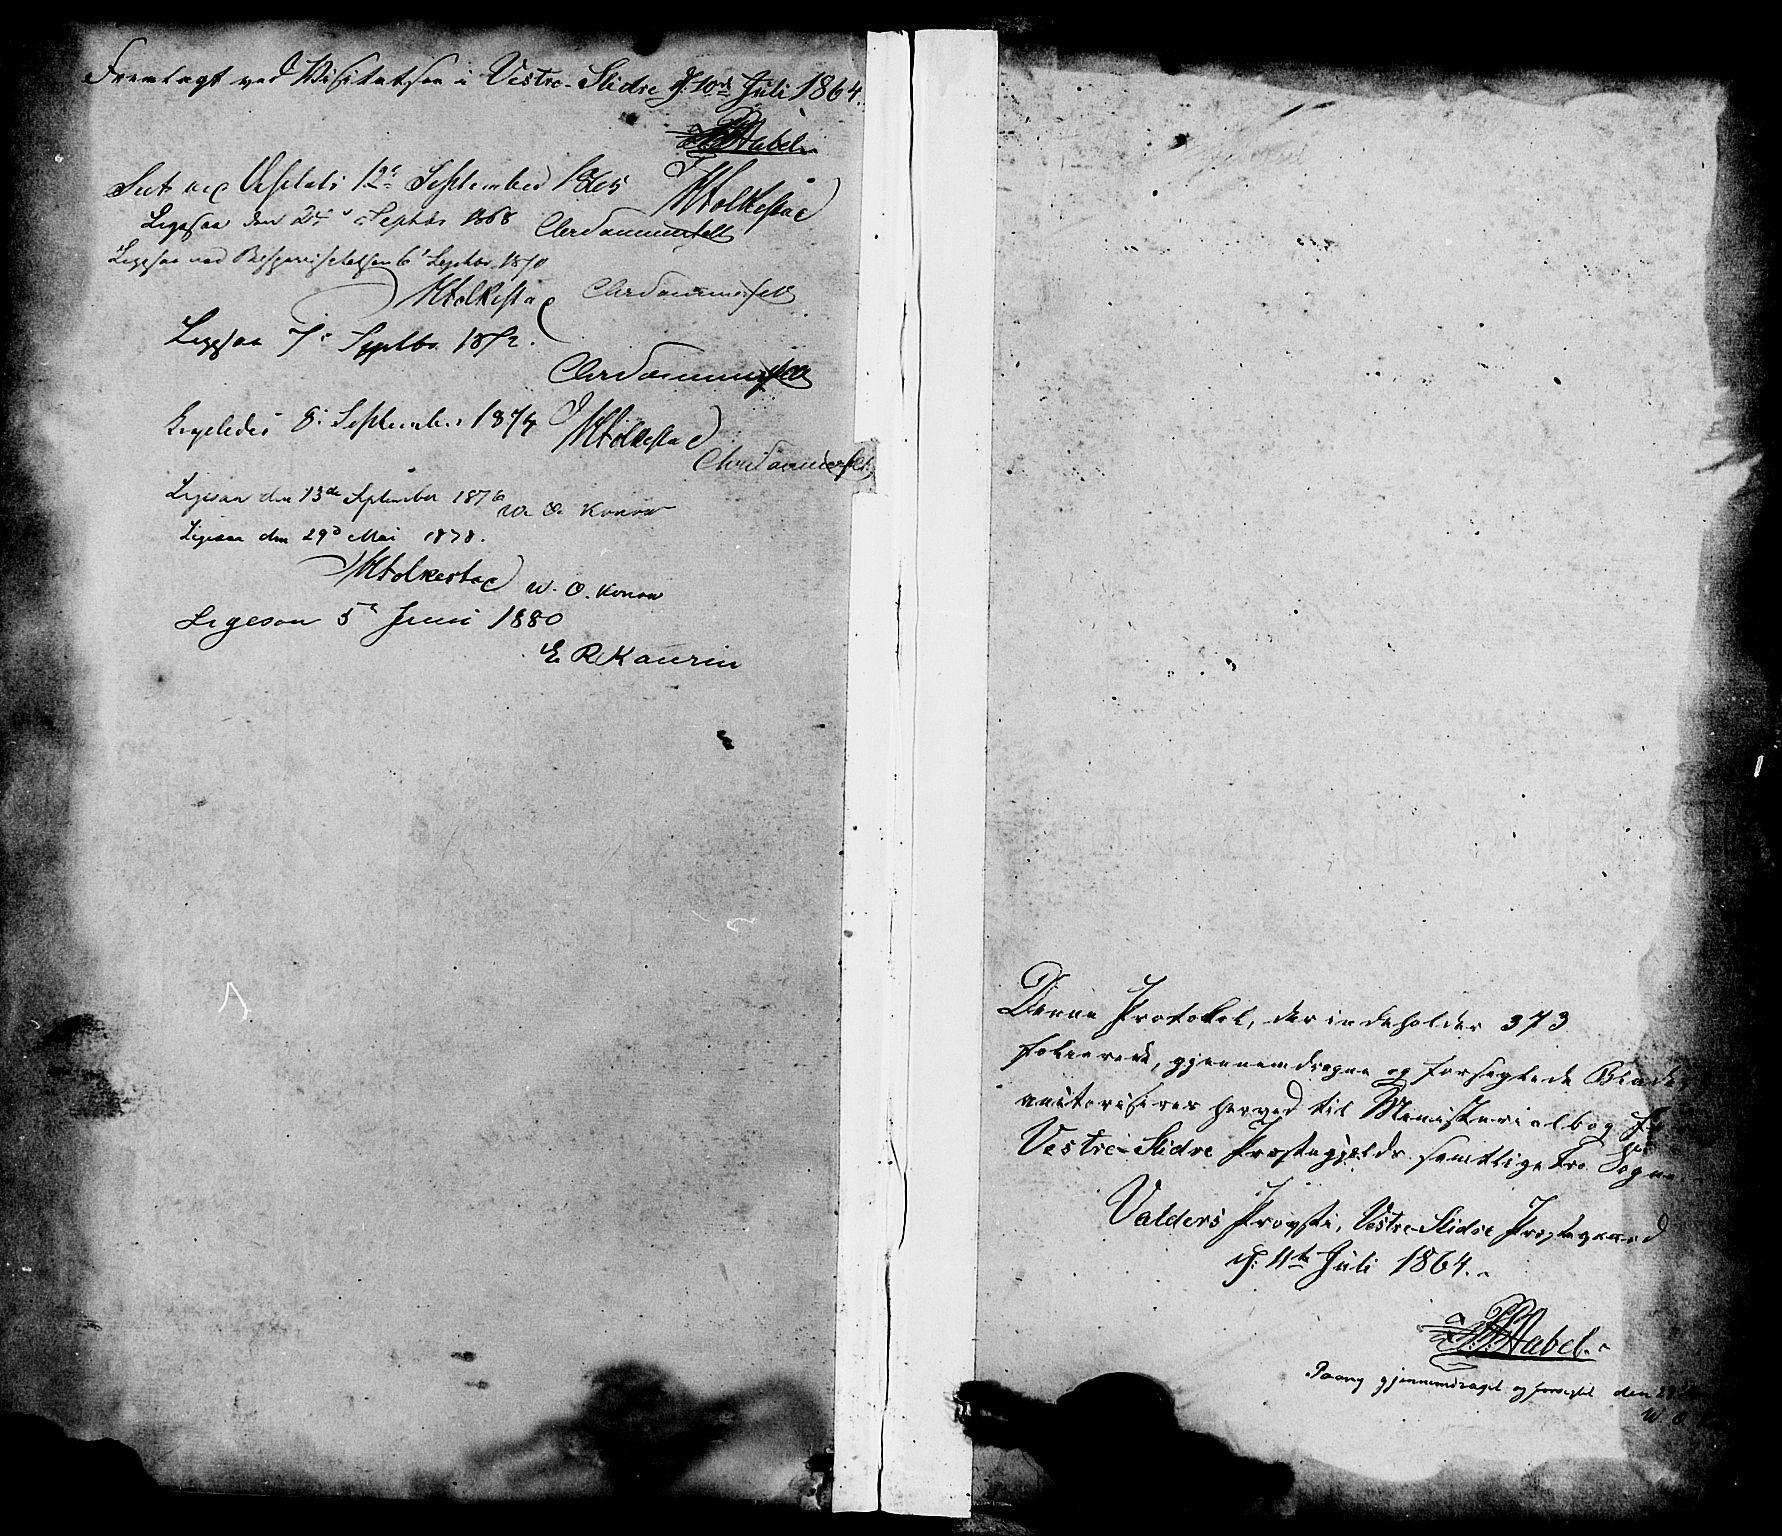 SAH, Vestre Slidre prestekontor, Ministerialbok nr. 3, 1865-1880